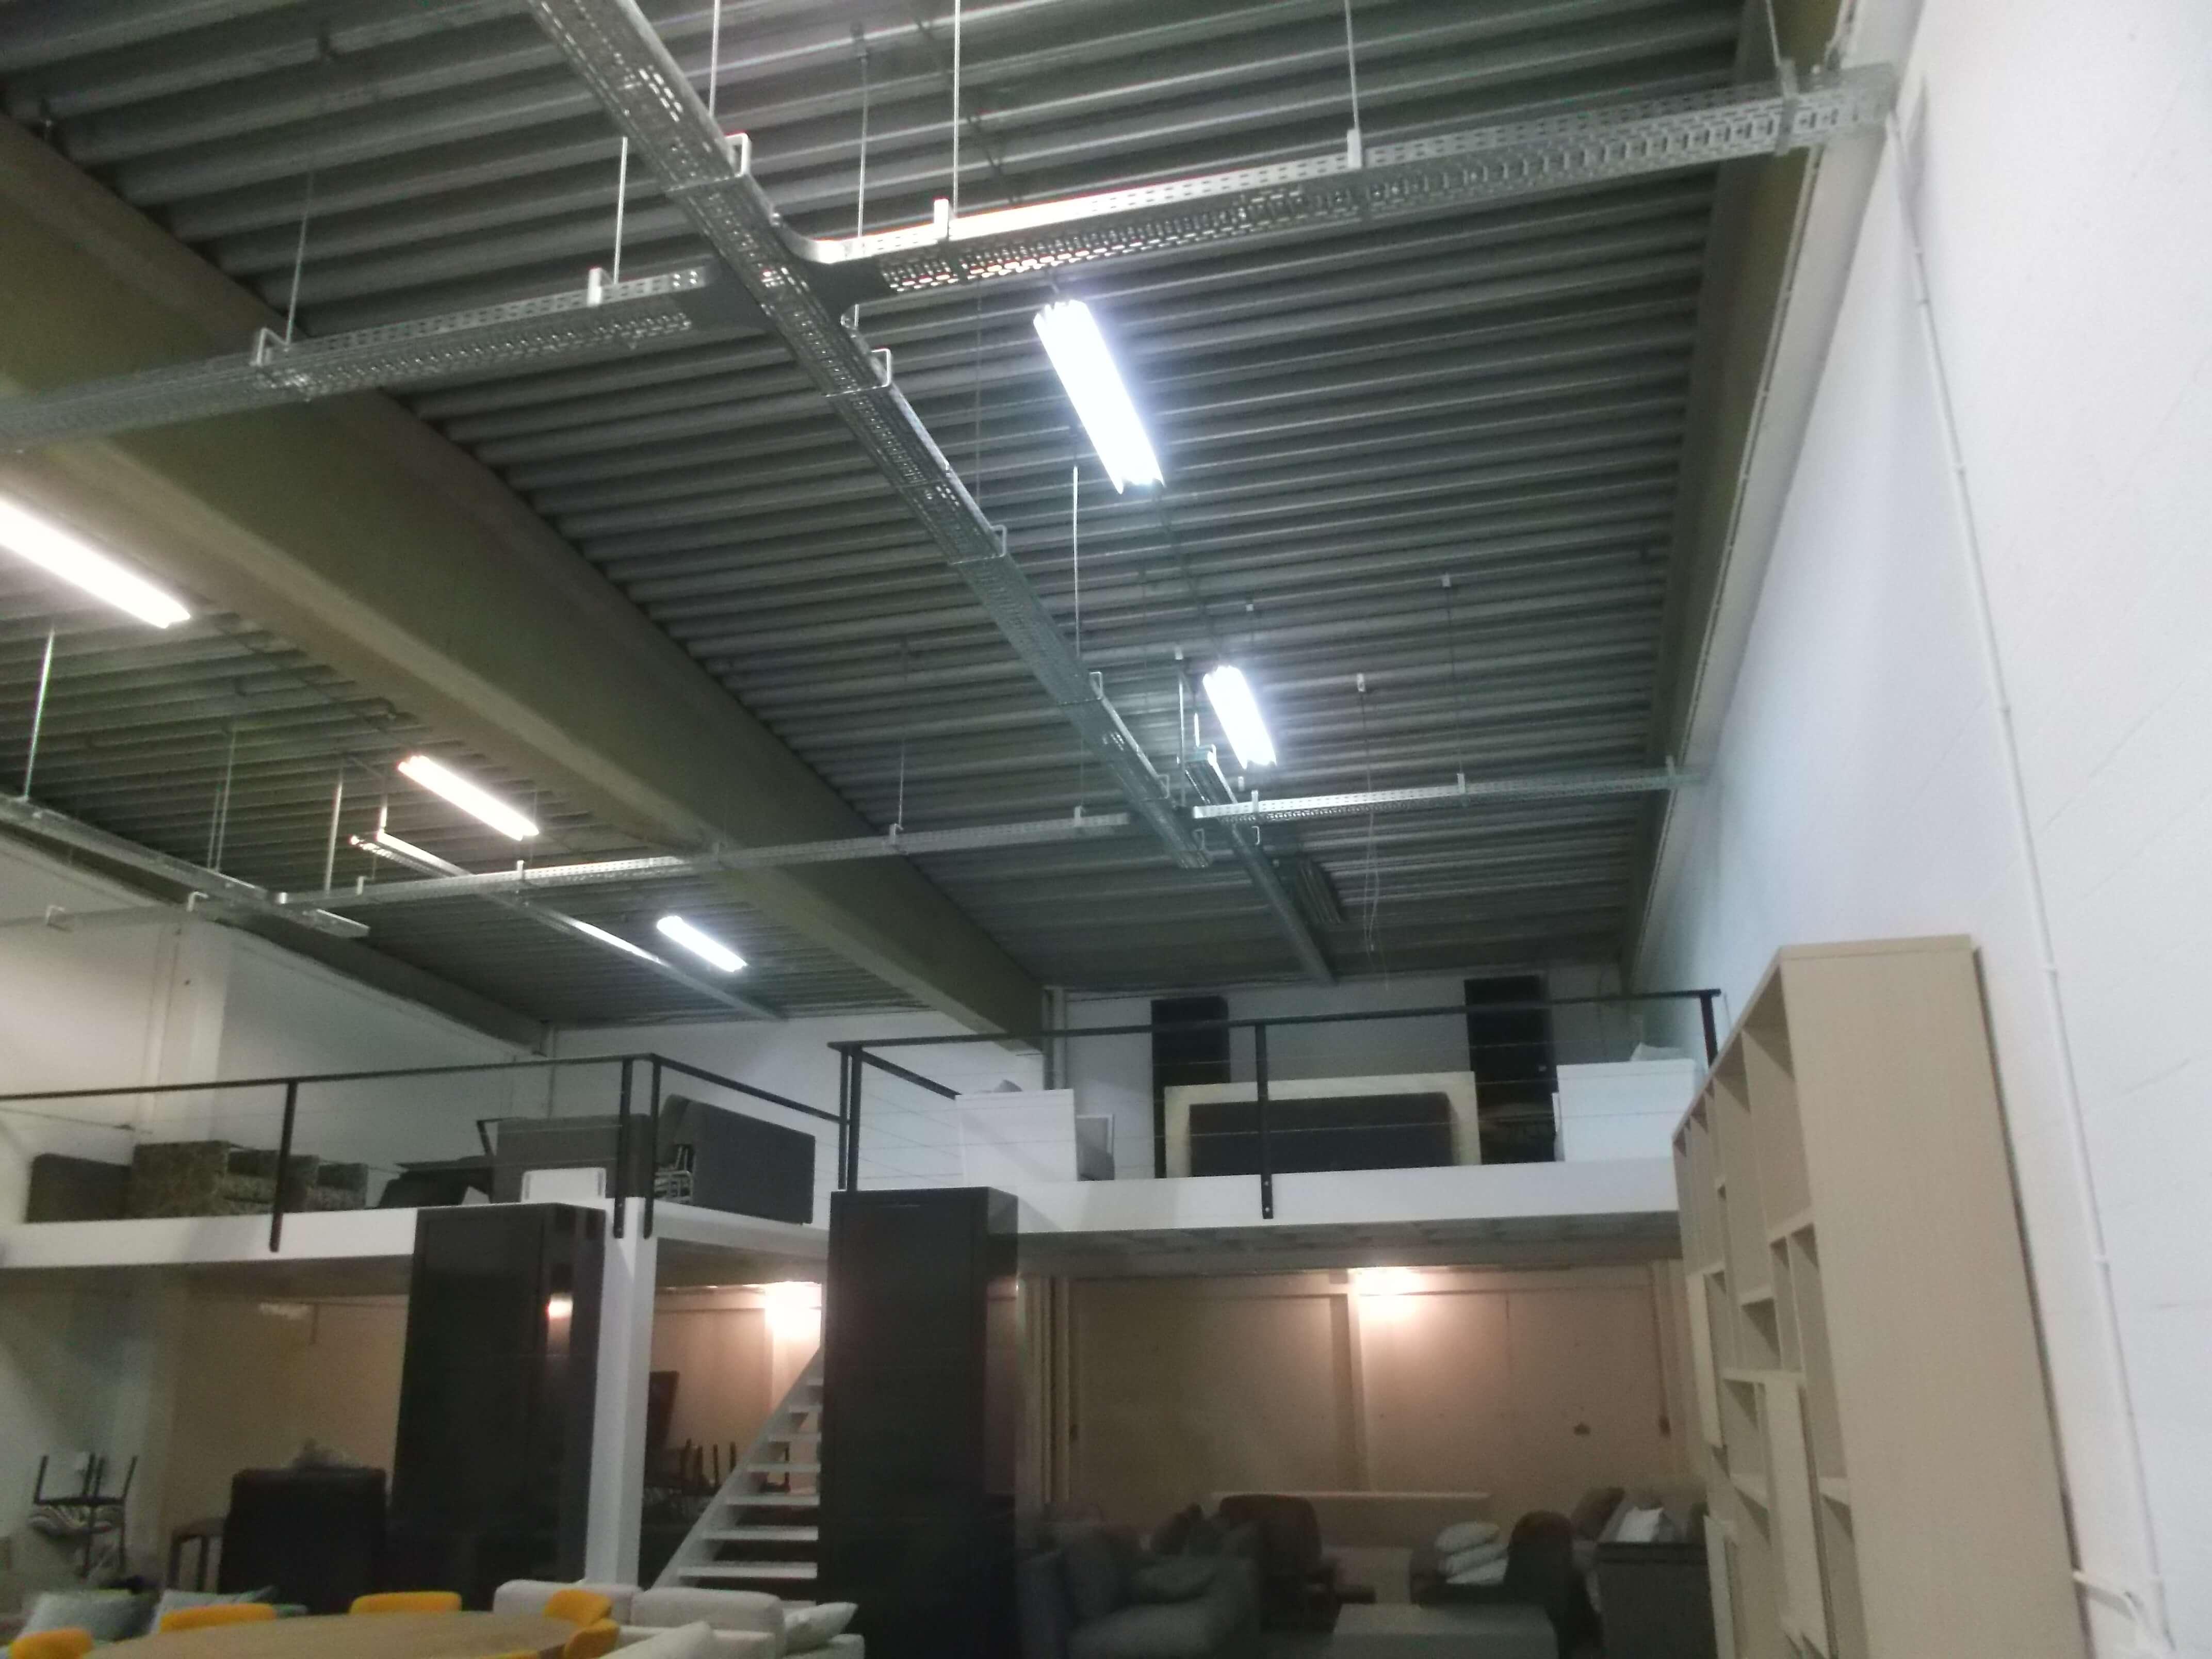 ph-galerie-electricite-vanhoyesprl